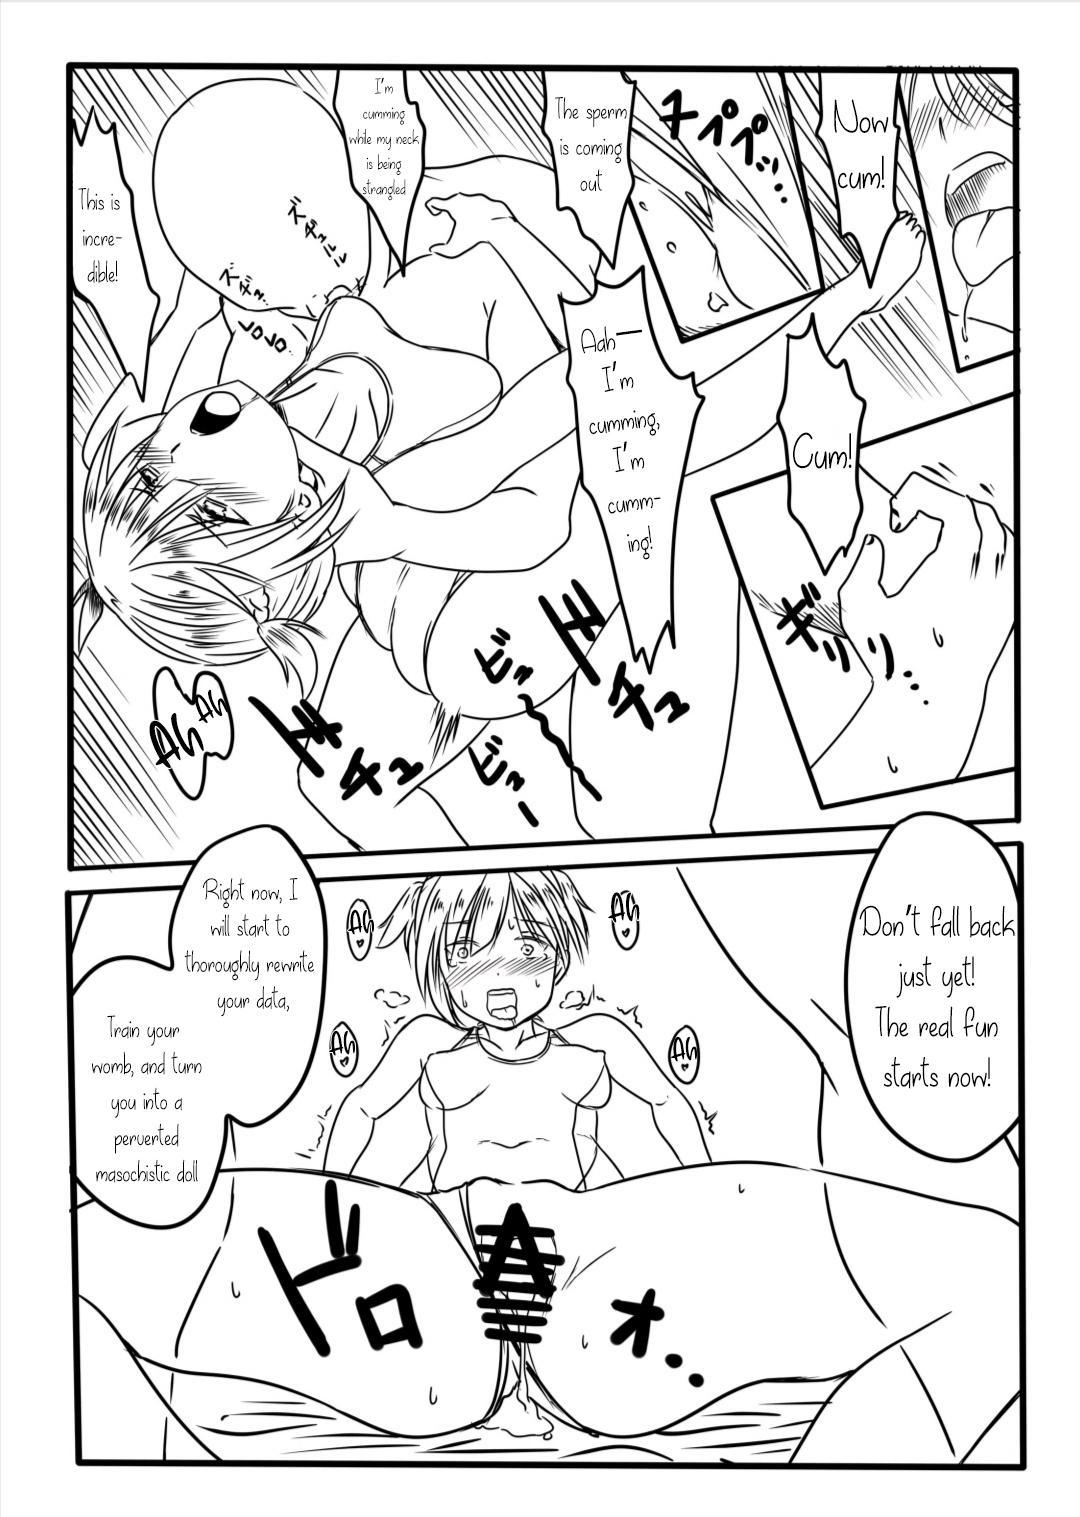 Hoshi 5 Hand Gun ga Sex Skin o Kiserarete Love Doll Mission o Shiirrareru Hon 10